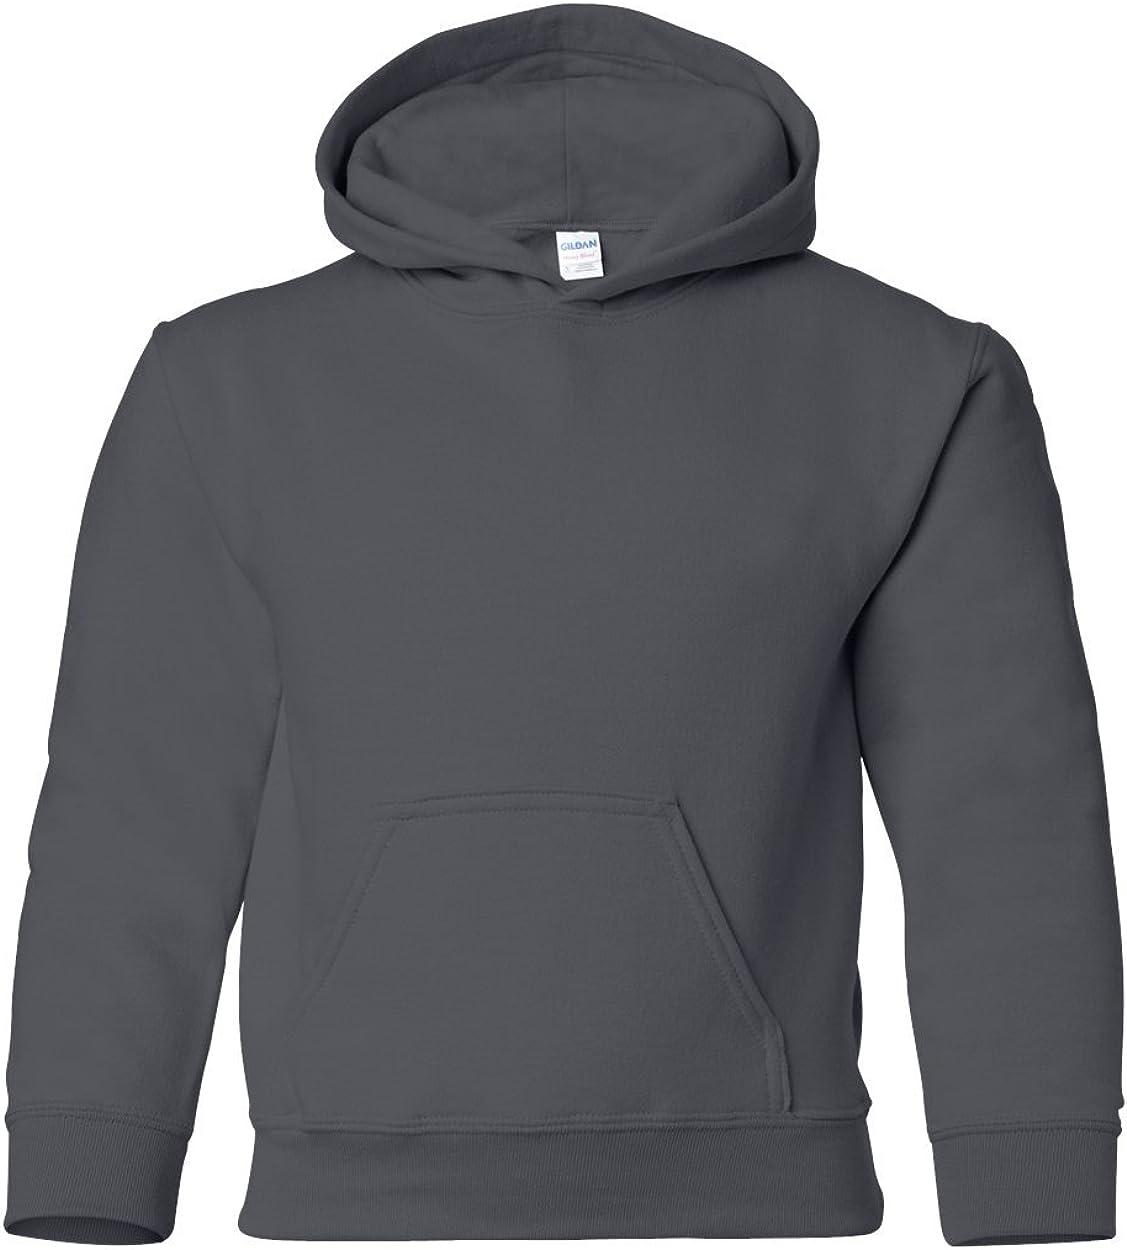 Gildan Heavy Blend Youth Hooded Sweatshirt, Charcoal, Large